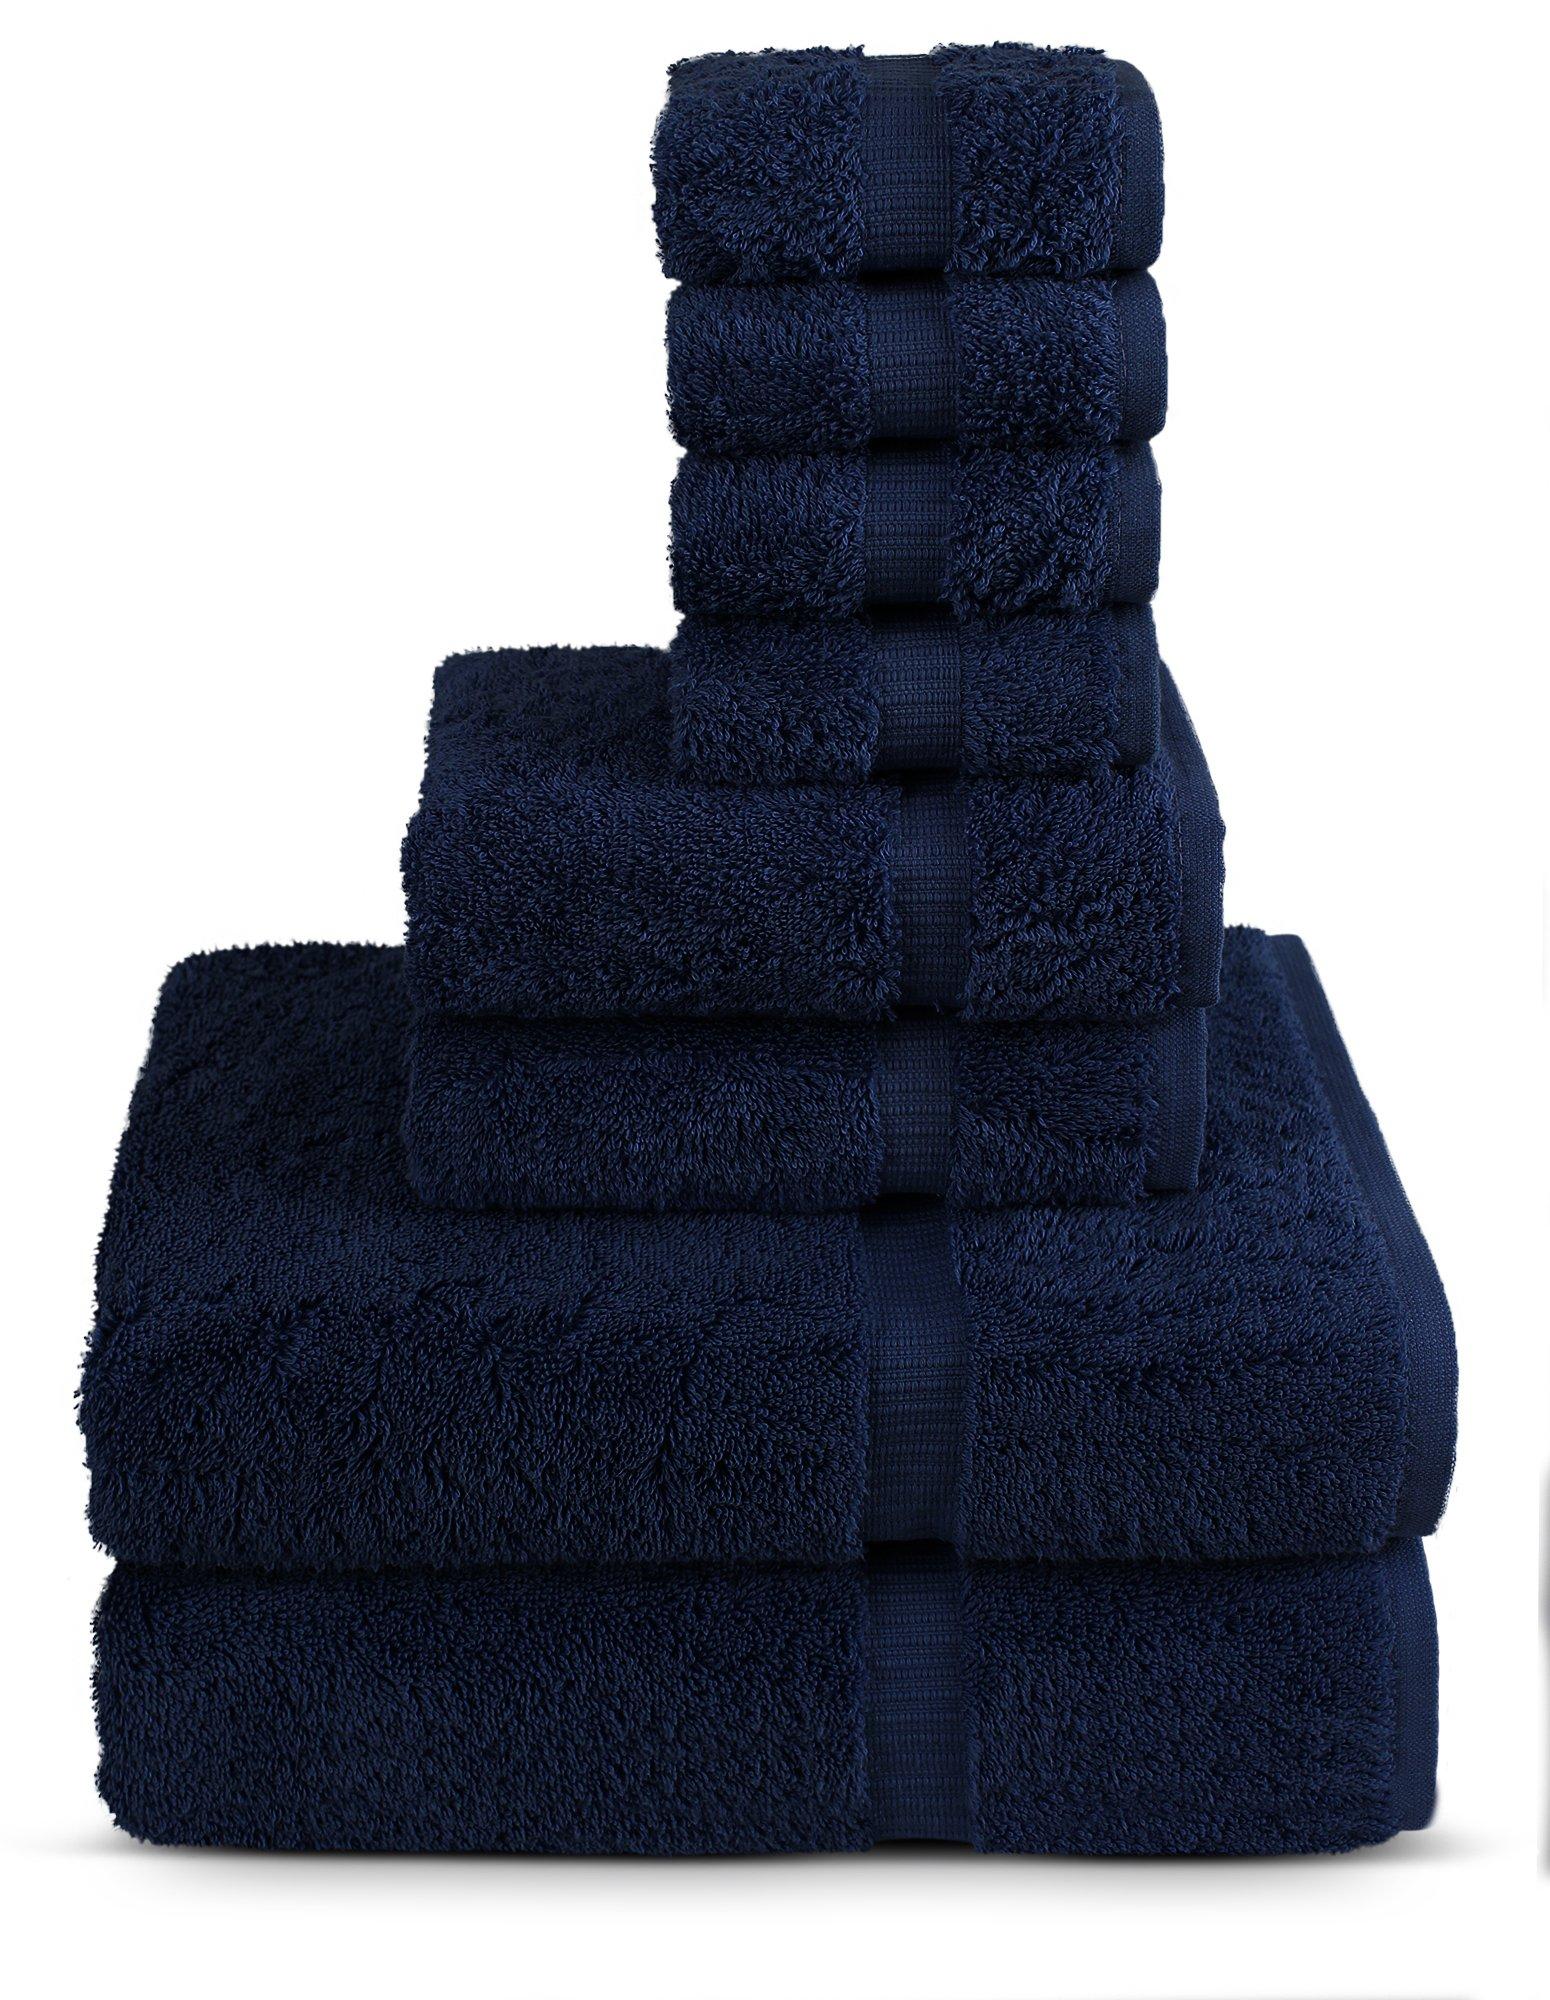 8 Piece Turkish Luxury Turkish Cotton Towel Set - Eco Friendly, 2 Bath Towels, 2 Hand Towels, 4 Wash Clothes by Turkuoise Turkish Towel (Navy Blue)